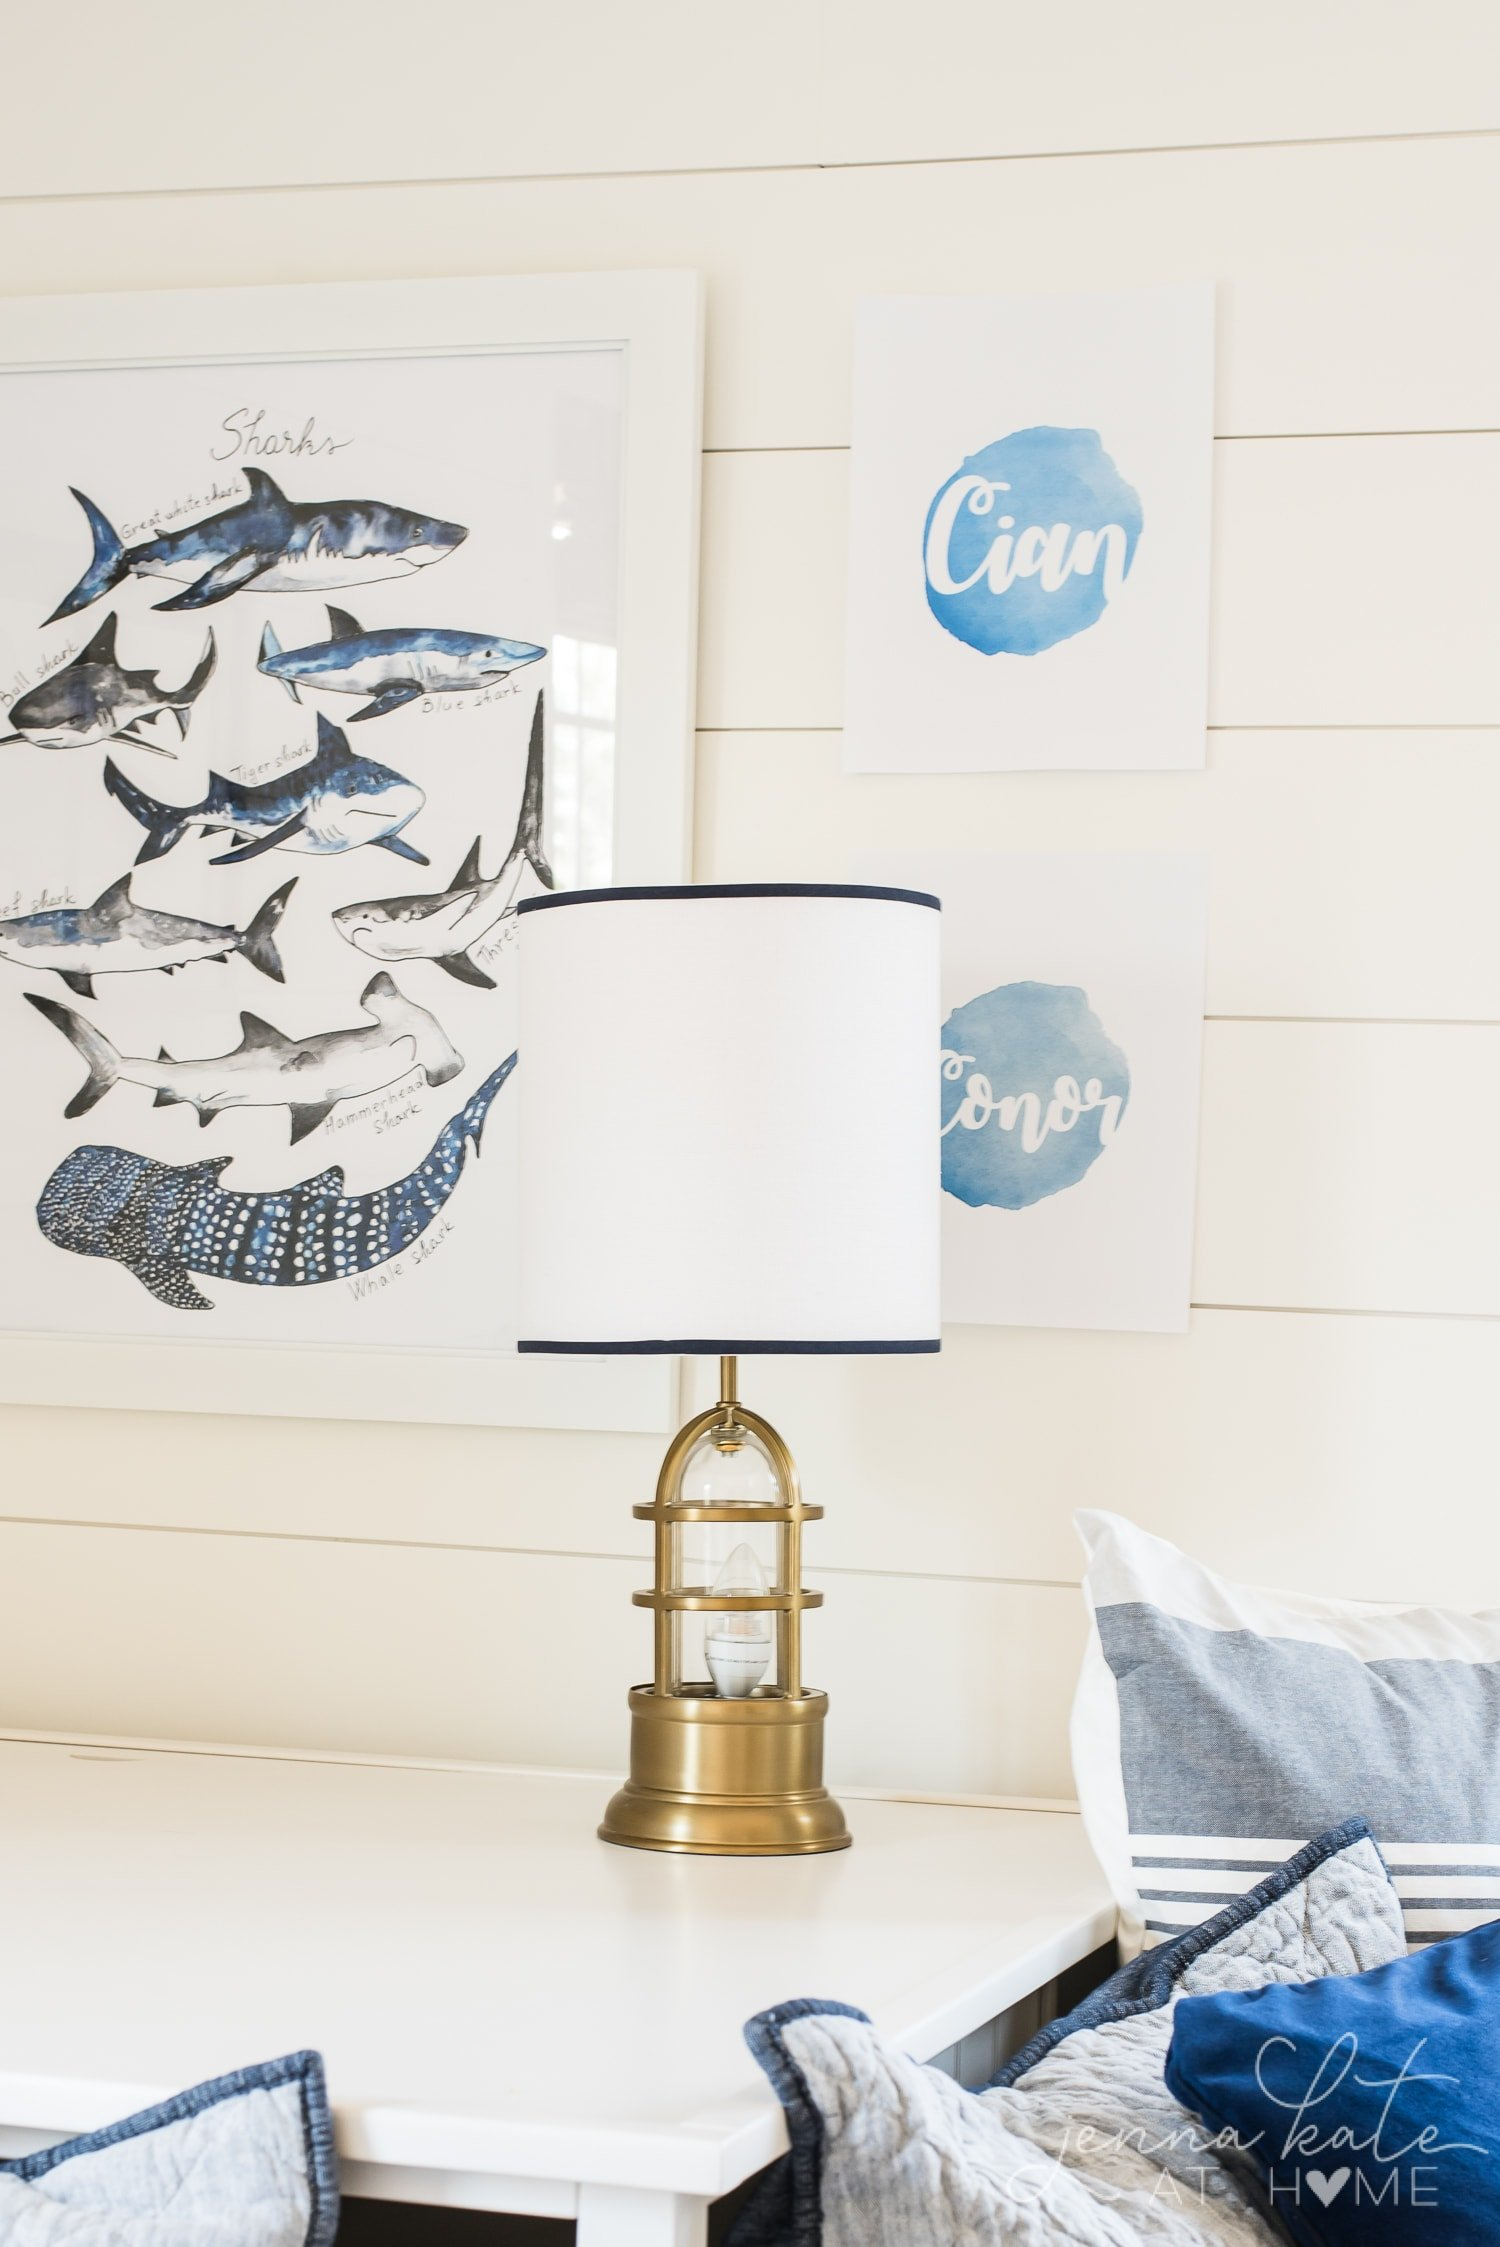 Nautical style bedroom lamp, shark print and DIY name signs